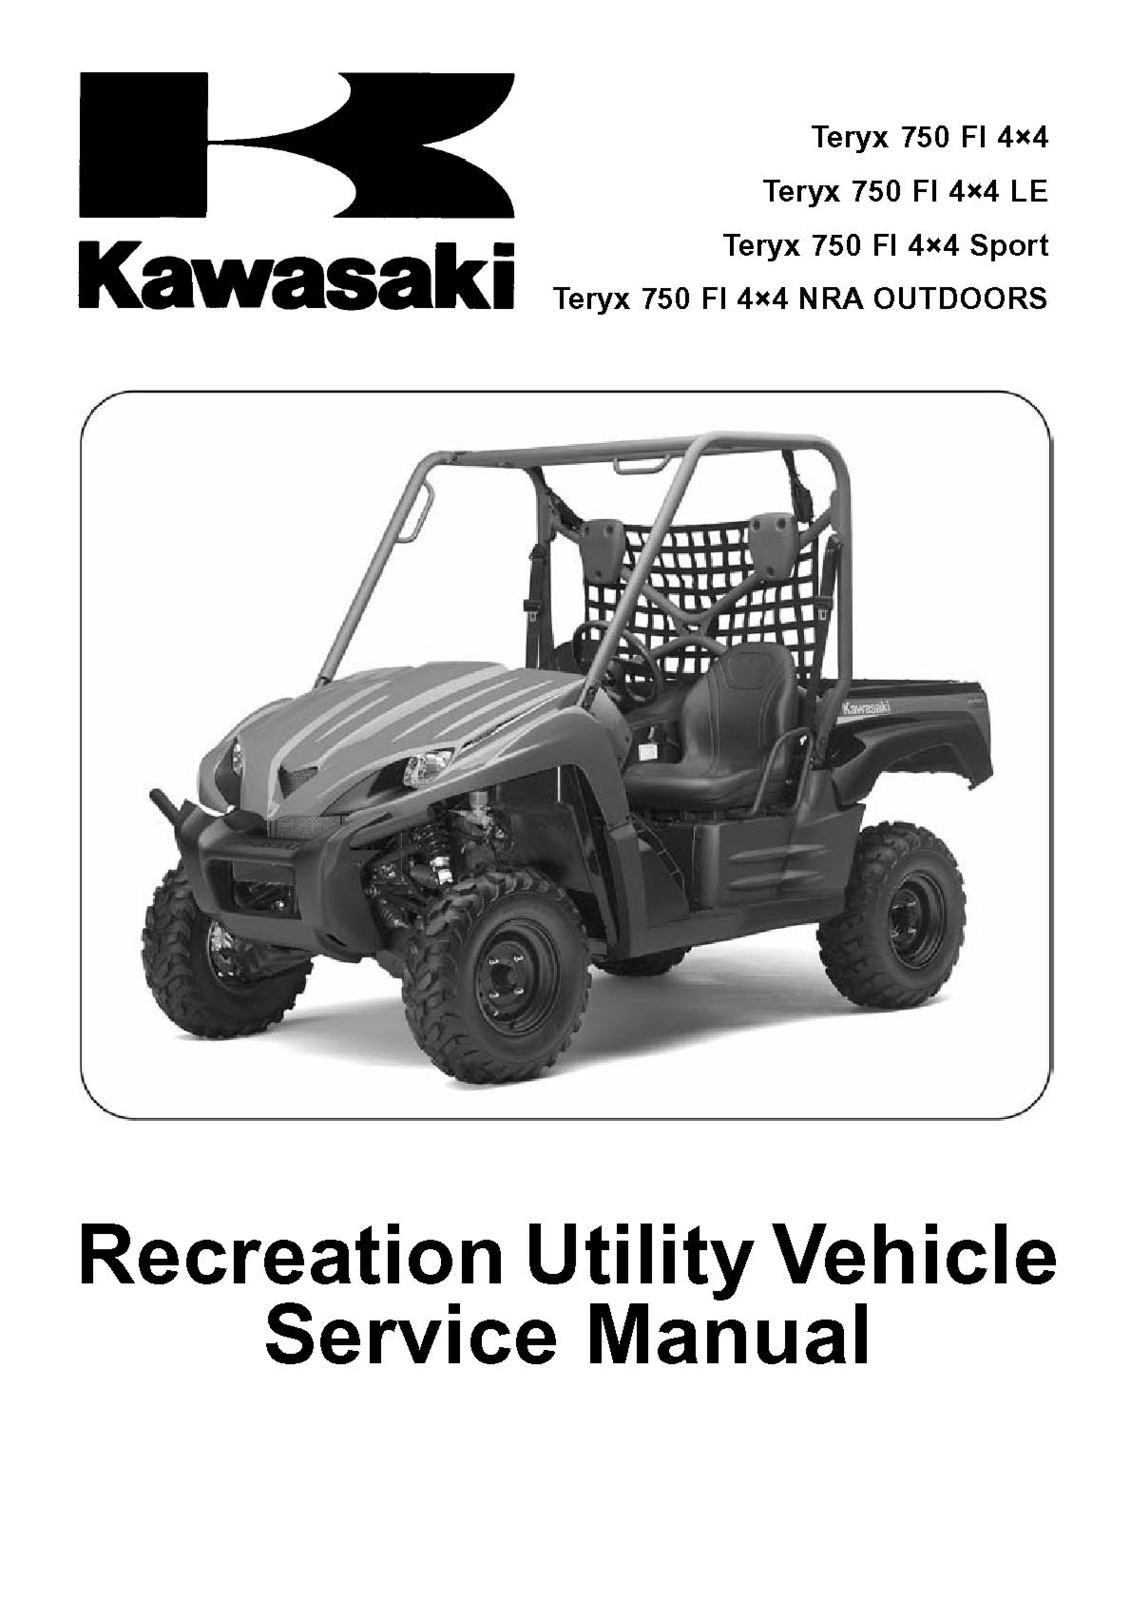 09 kawasaki teryx 750 fi 4x4 le sport nra and similar items rh bonanza com 2009 kawasaki teryx service manual pdf 2009 kawasaki teryx 750 owners manual